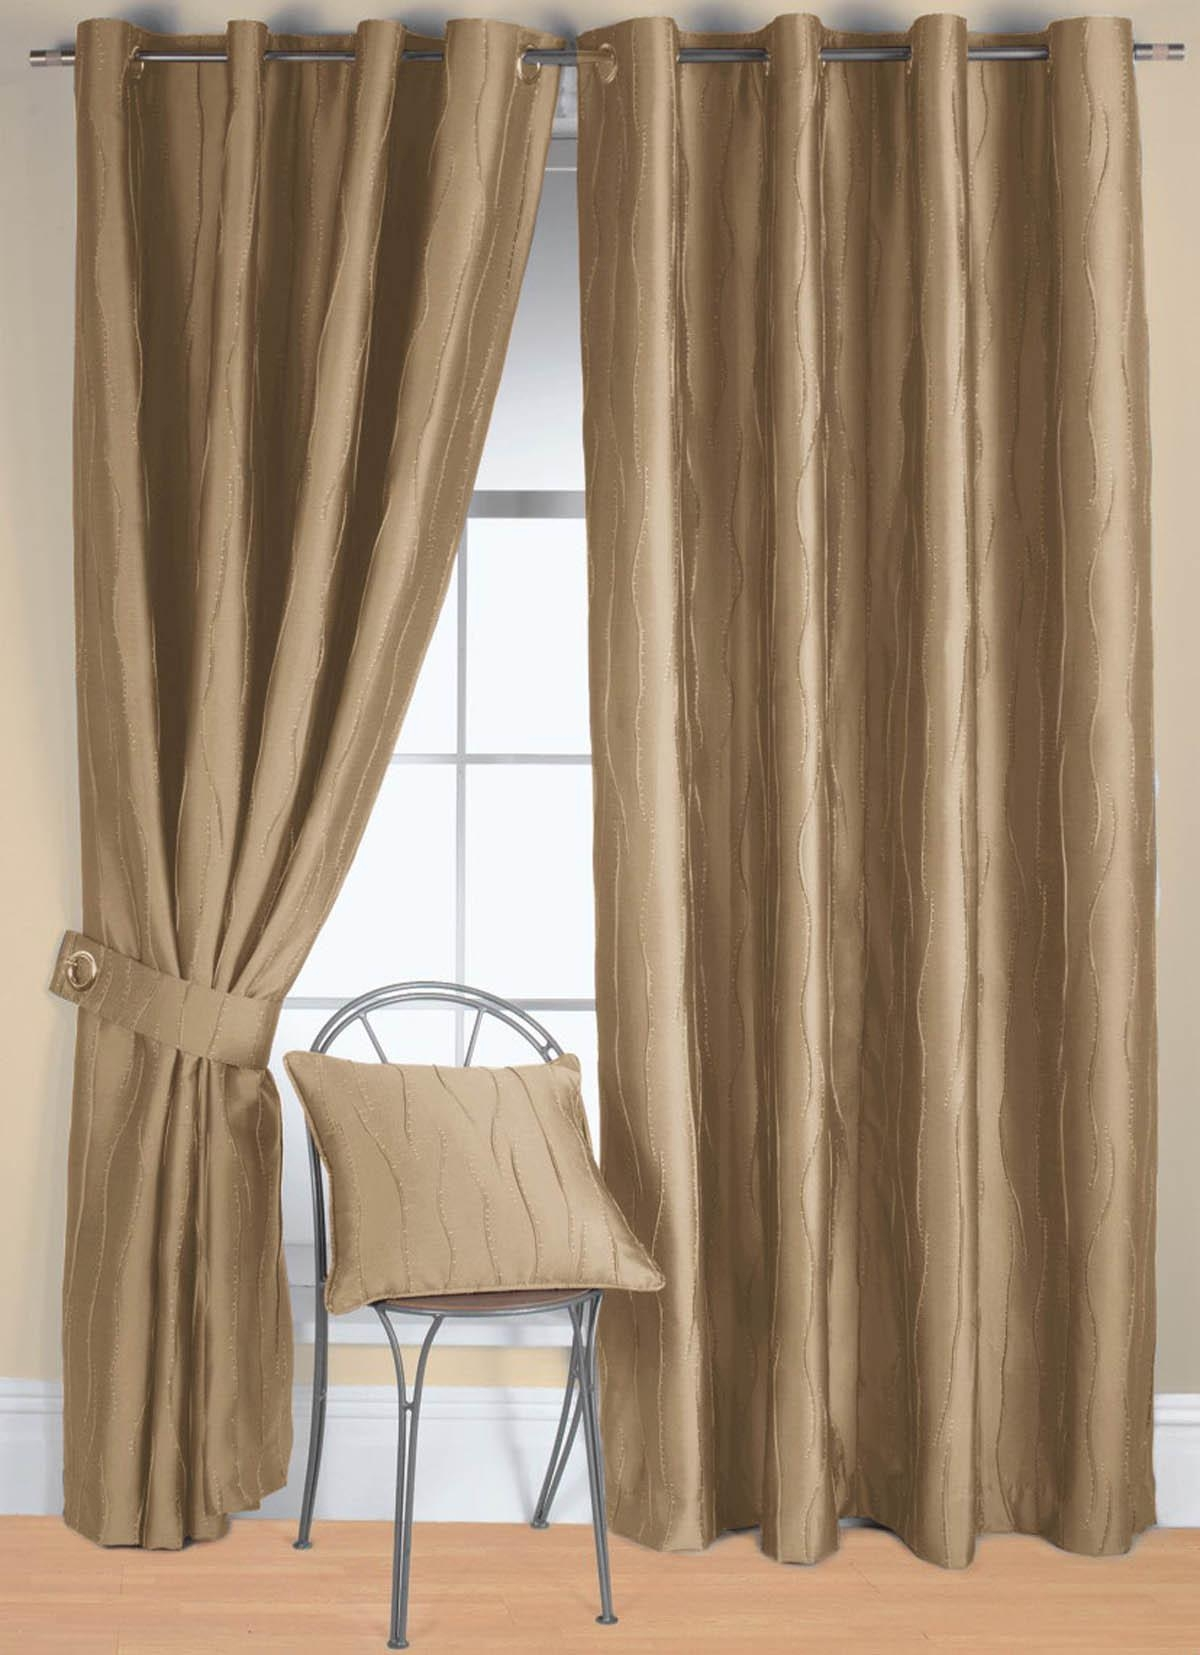 Linen Blackout Curtains 108 Business For Curtains Decoration Throughout Plain Linen Curtains (View 8 of 15)